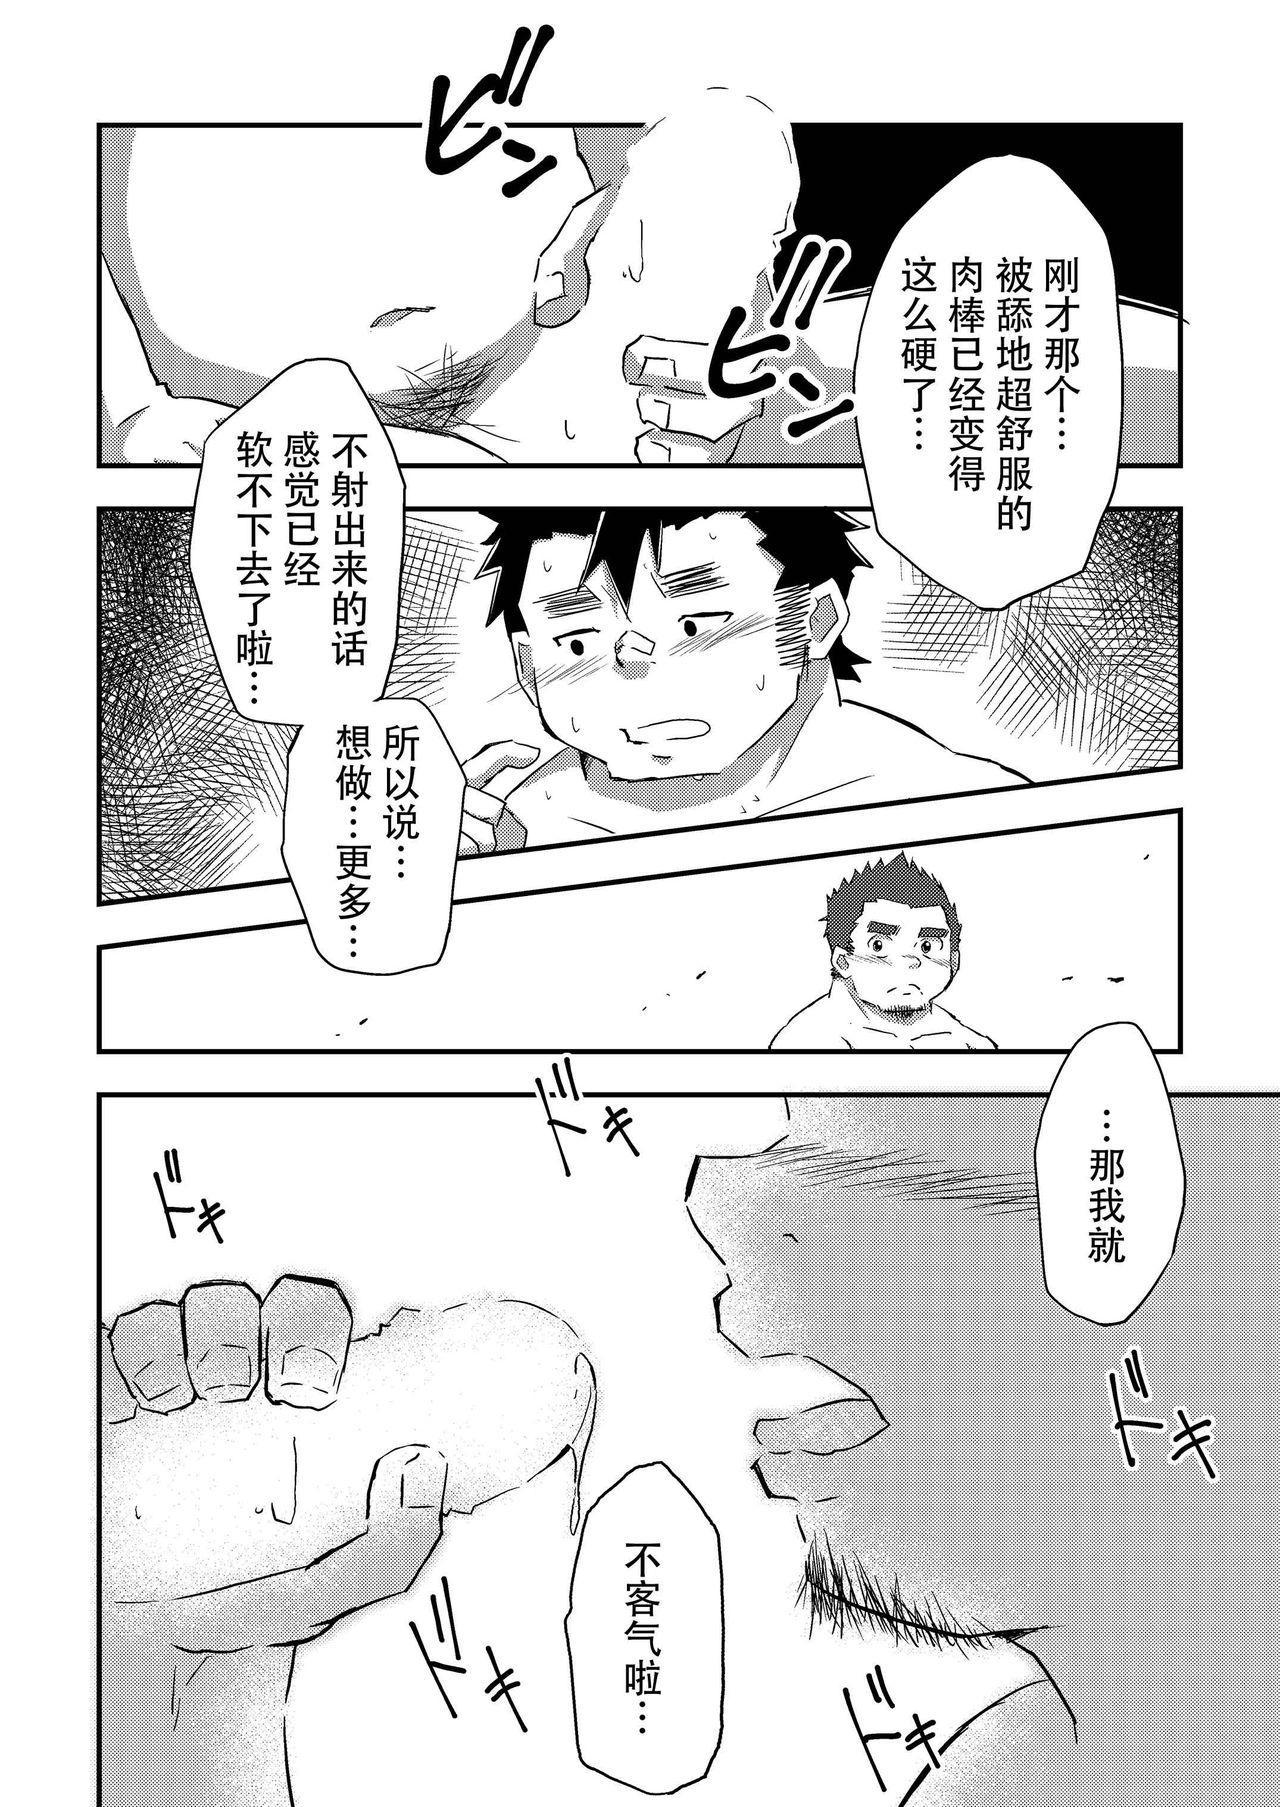 [CorkBOX (ngng)] Ise-kun wa Tamatte Iru. - Ise-kun is horny. [Chinese] {日曜日汉化} [Digital] 16